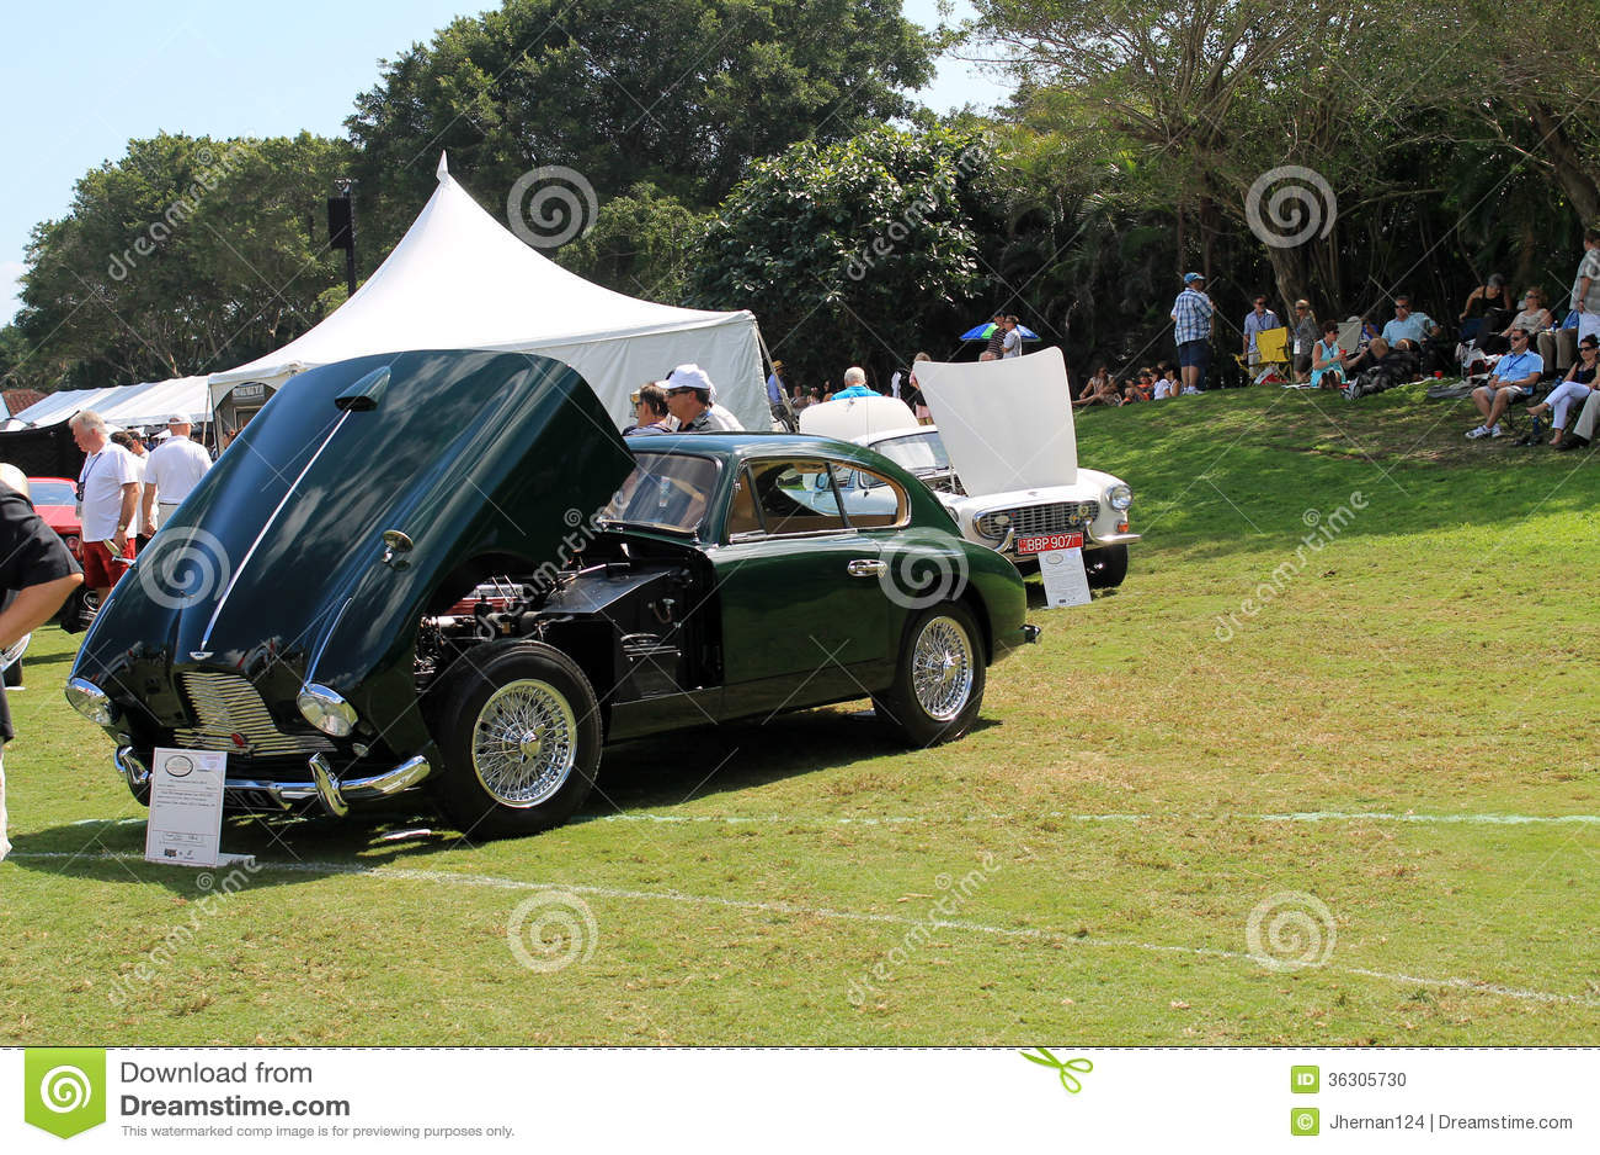 Classic British Sports Car Open Hood Its Revealing Its Engine Mechanicals Aston Martin Db Iii Public Event